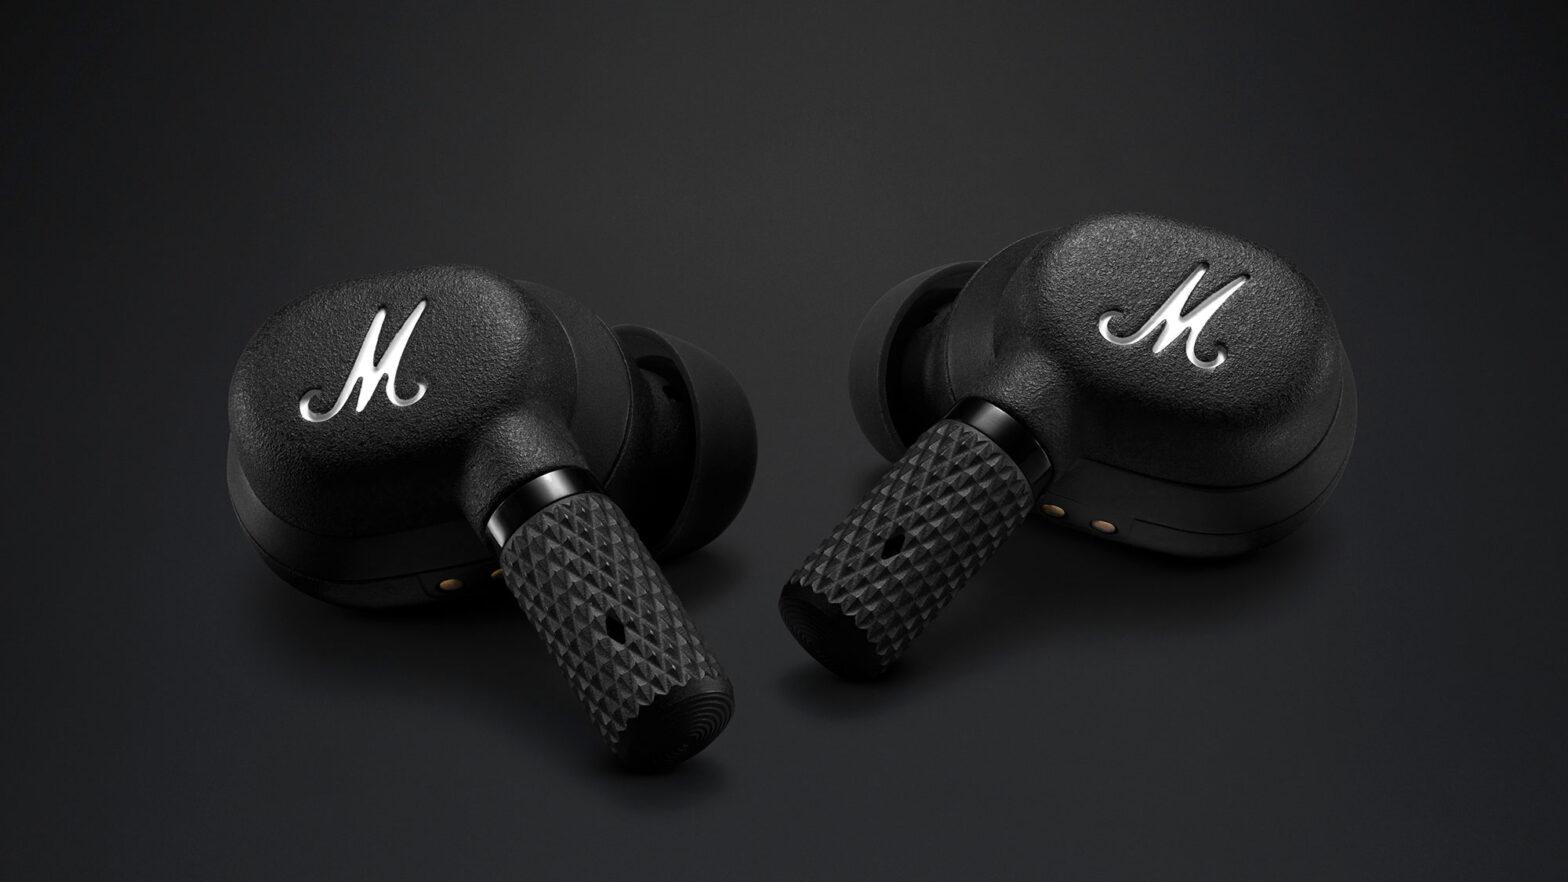 Marshall Minor III and Motif ANC TWS Earbuds